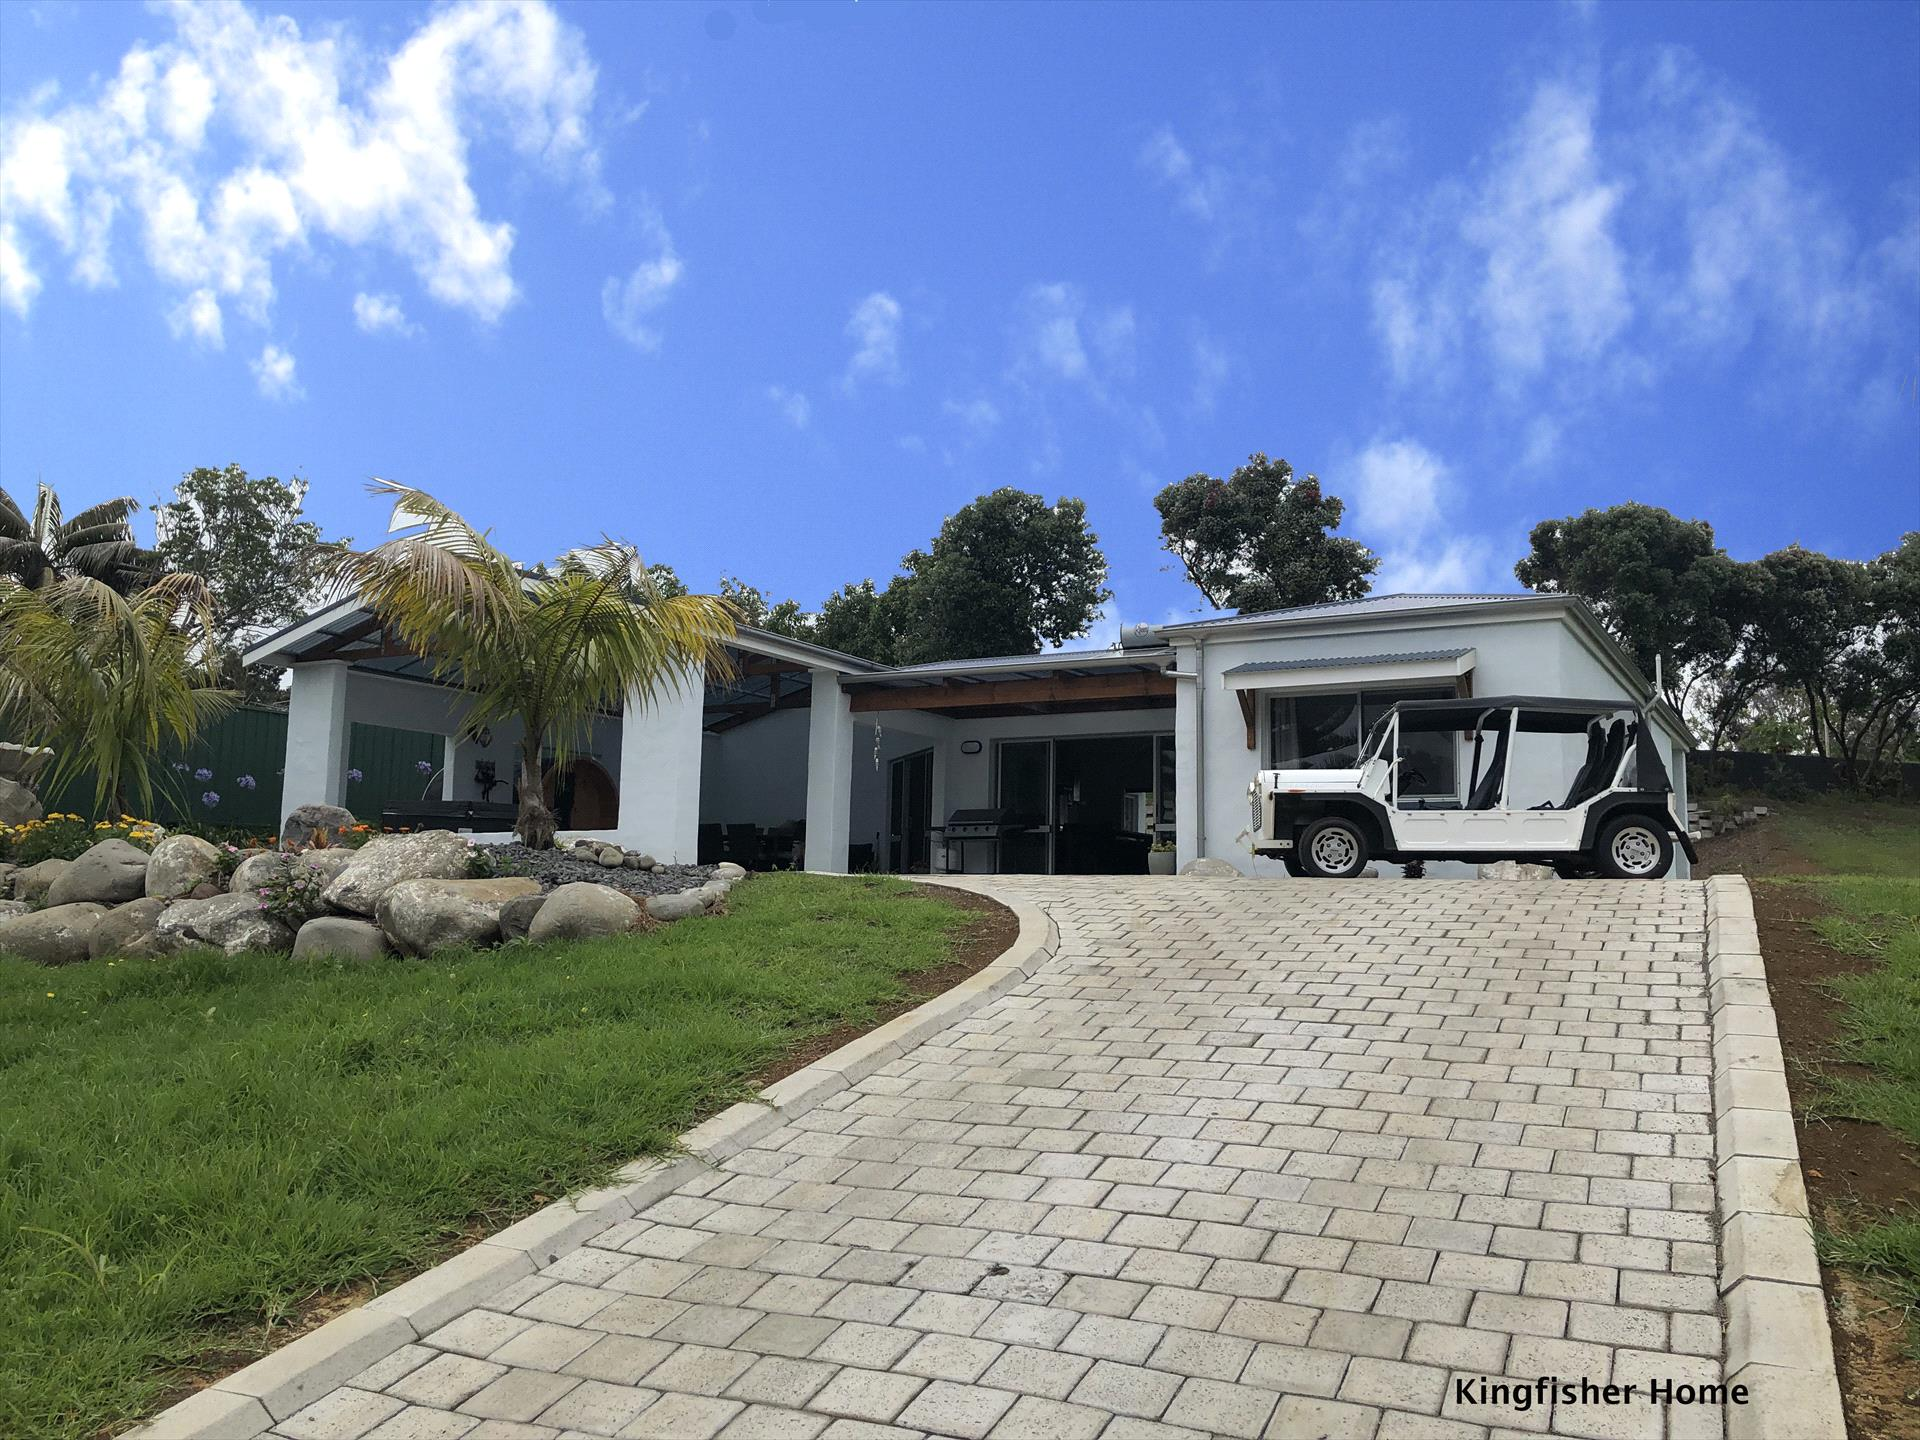 Kingfisher Home